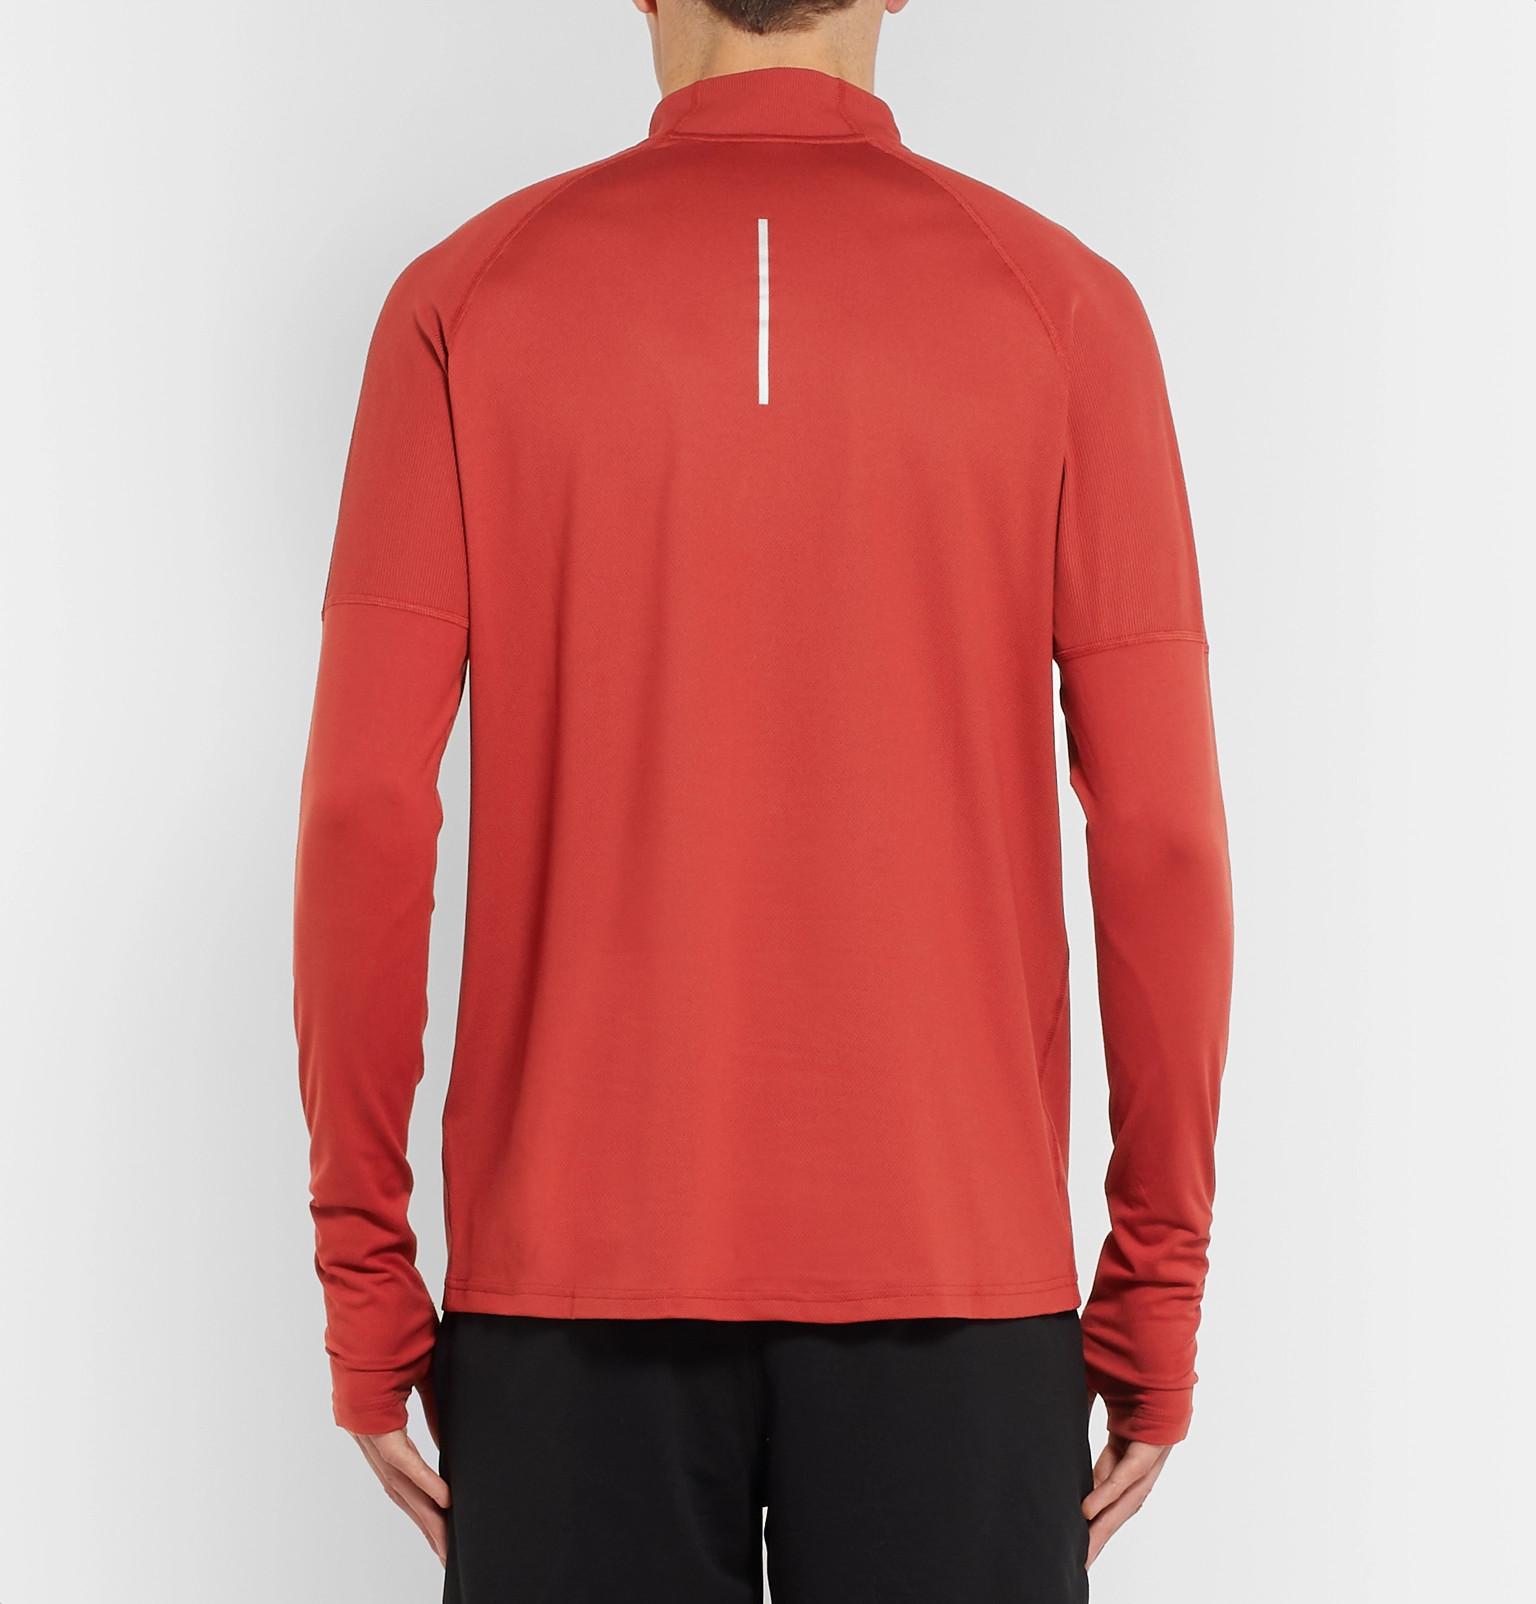 Nike Top Mélange Half Runningelement Sphere Therma Zip Dri Fit rwrW6R7q8O